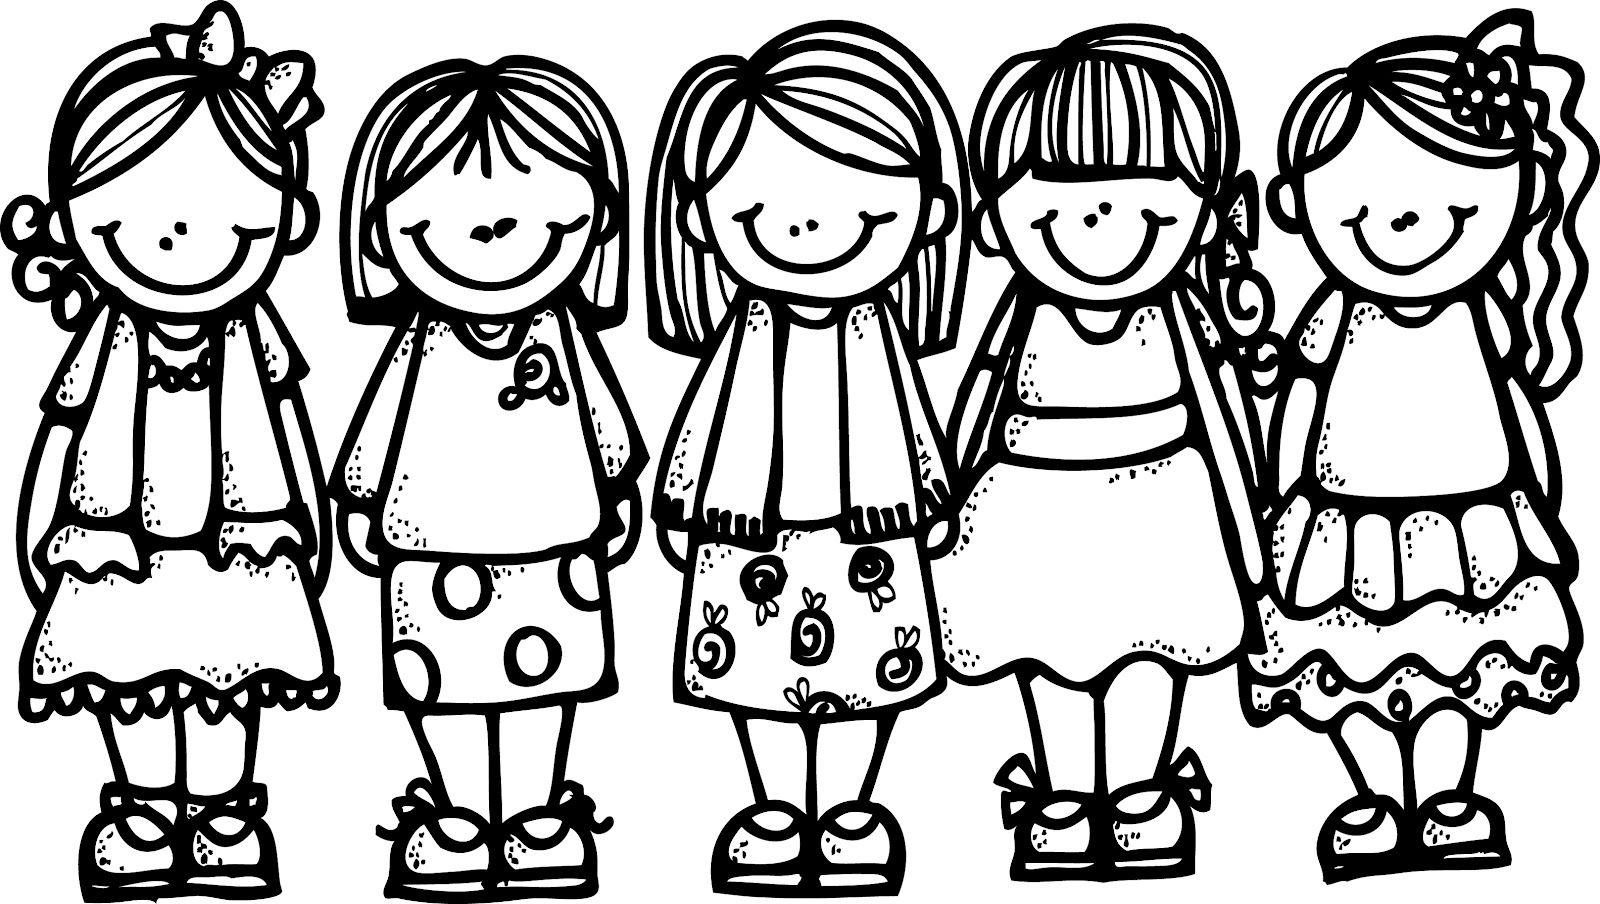 Lds clipart friendship day. Melonheadz illustrating activity days